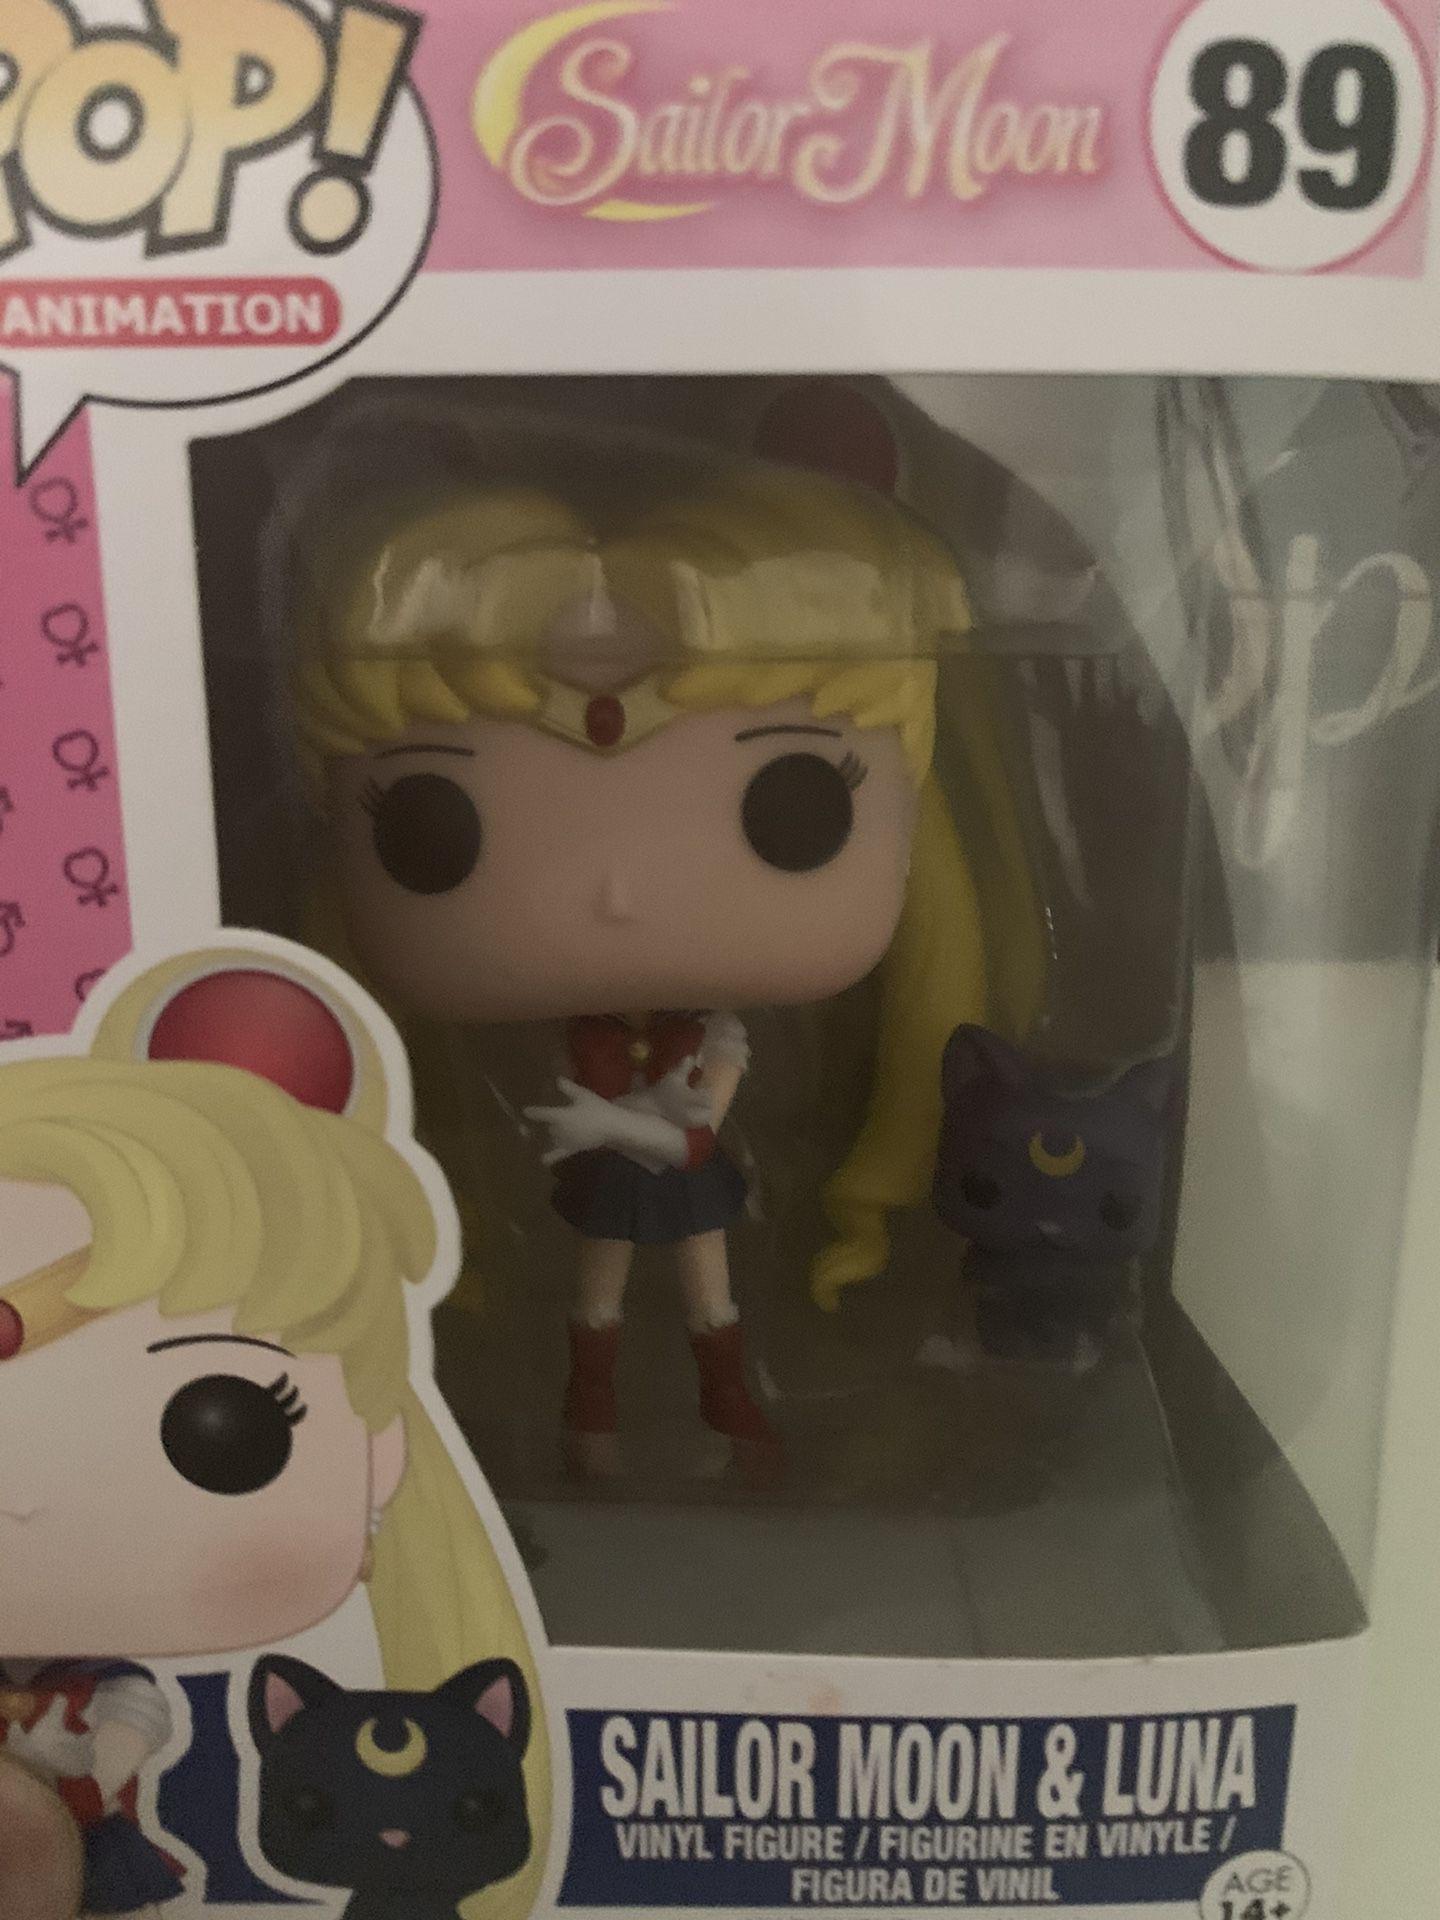 Sailor Moon POP! 89 Sailor Moon & Luna 295 Chibi Moon